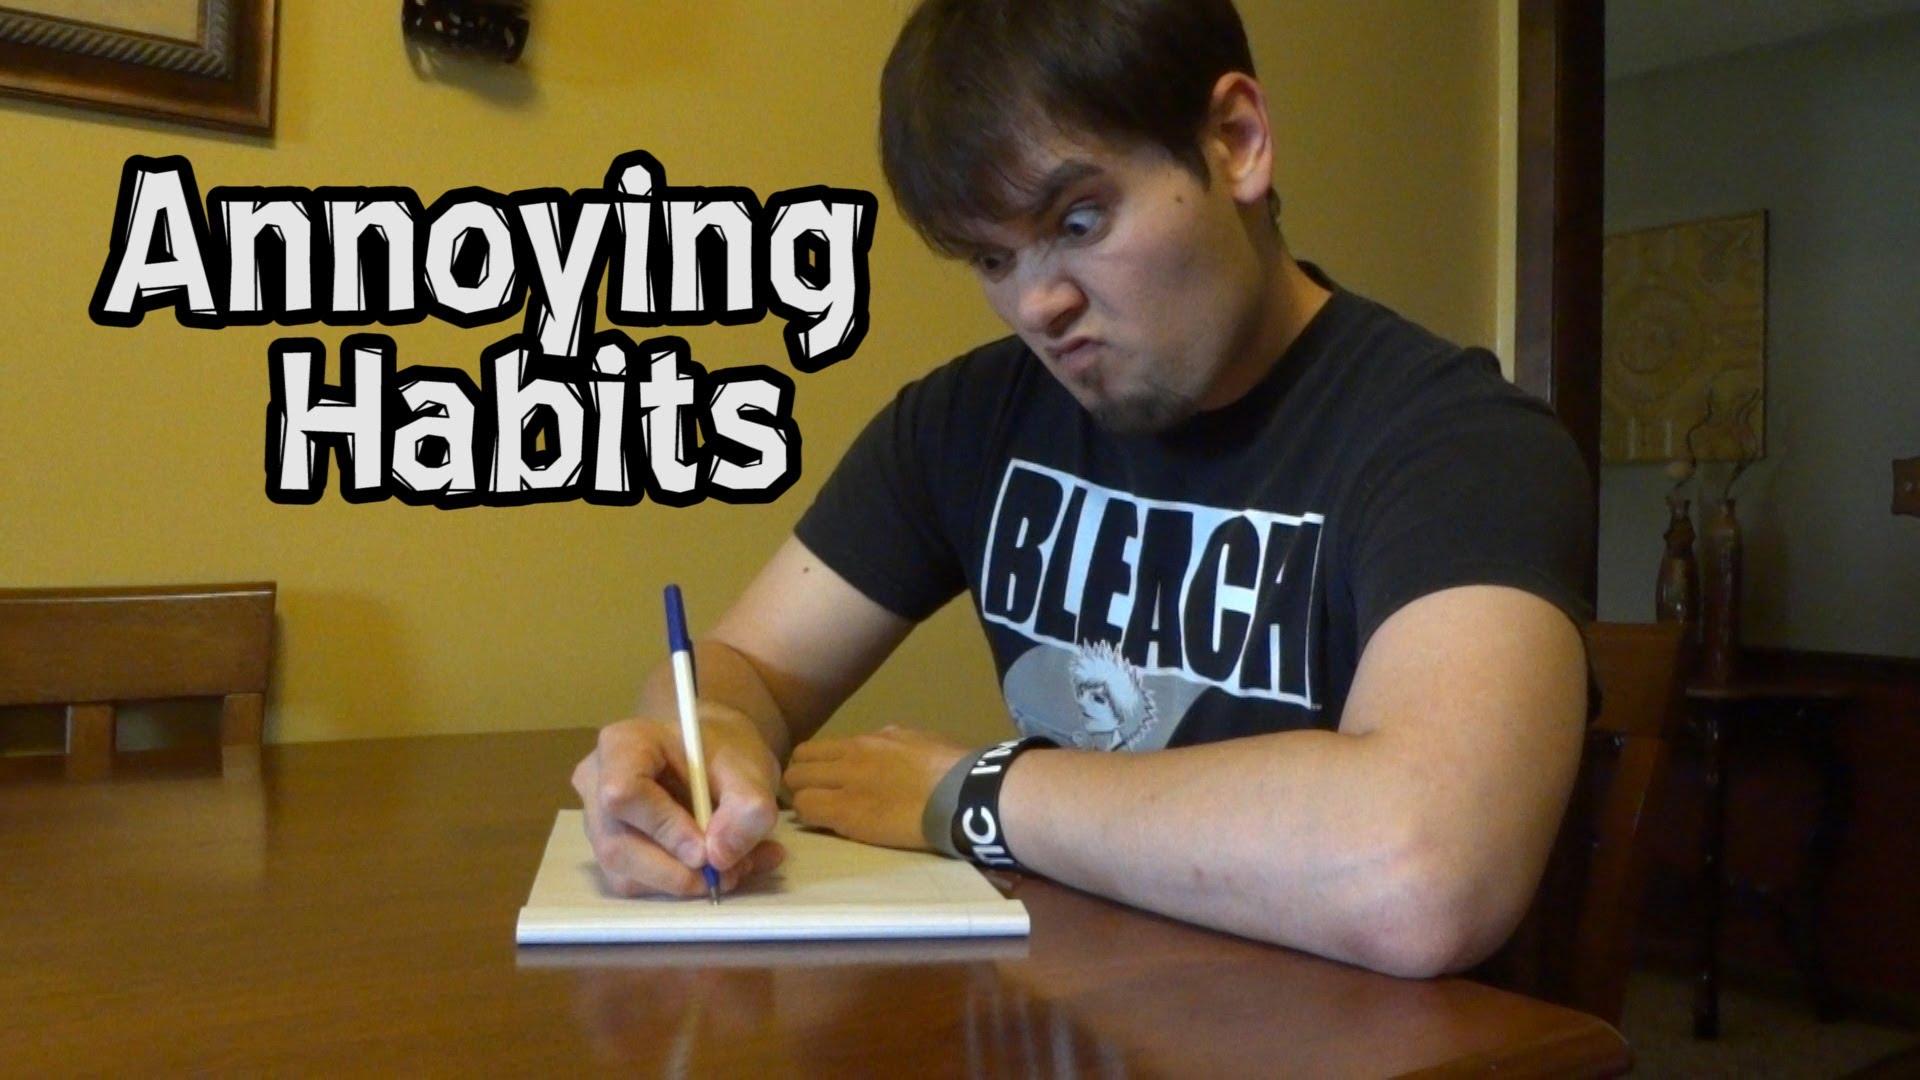 Annoying Habits